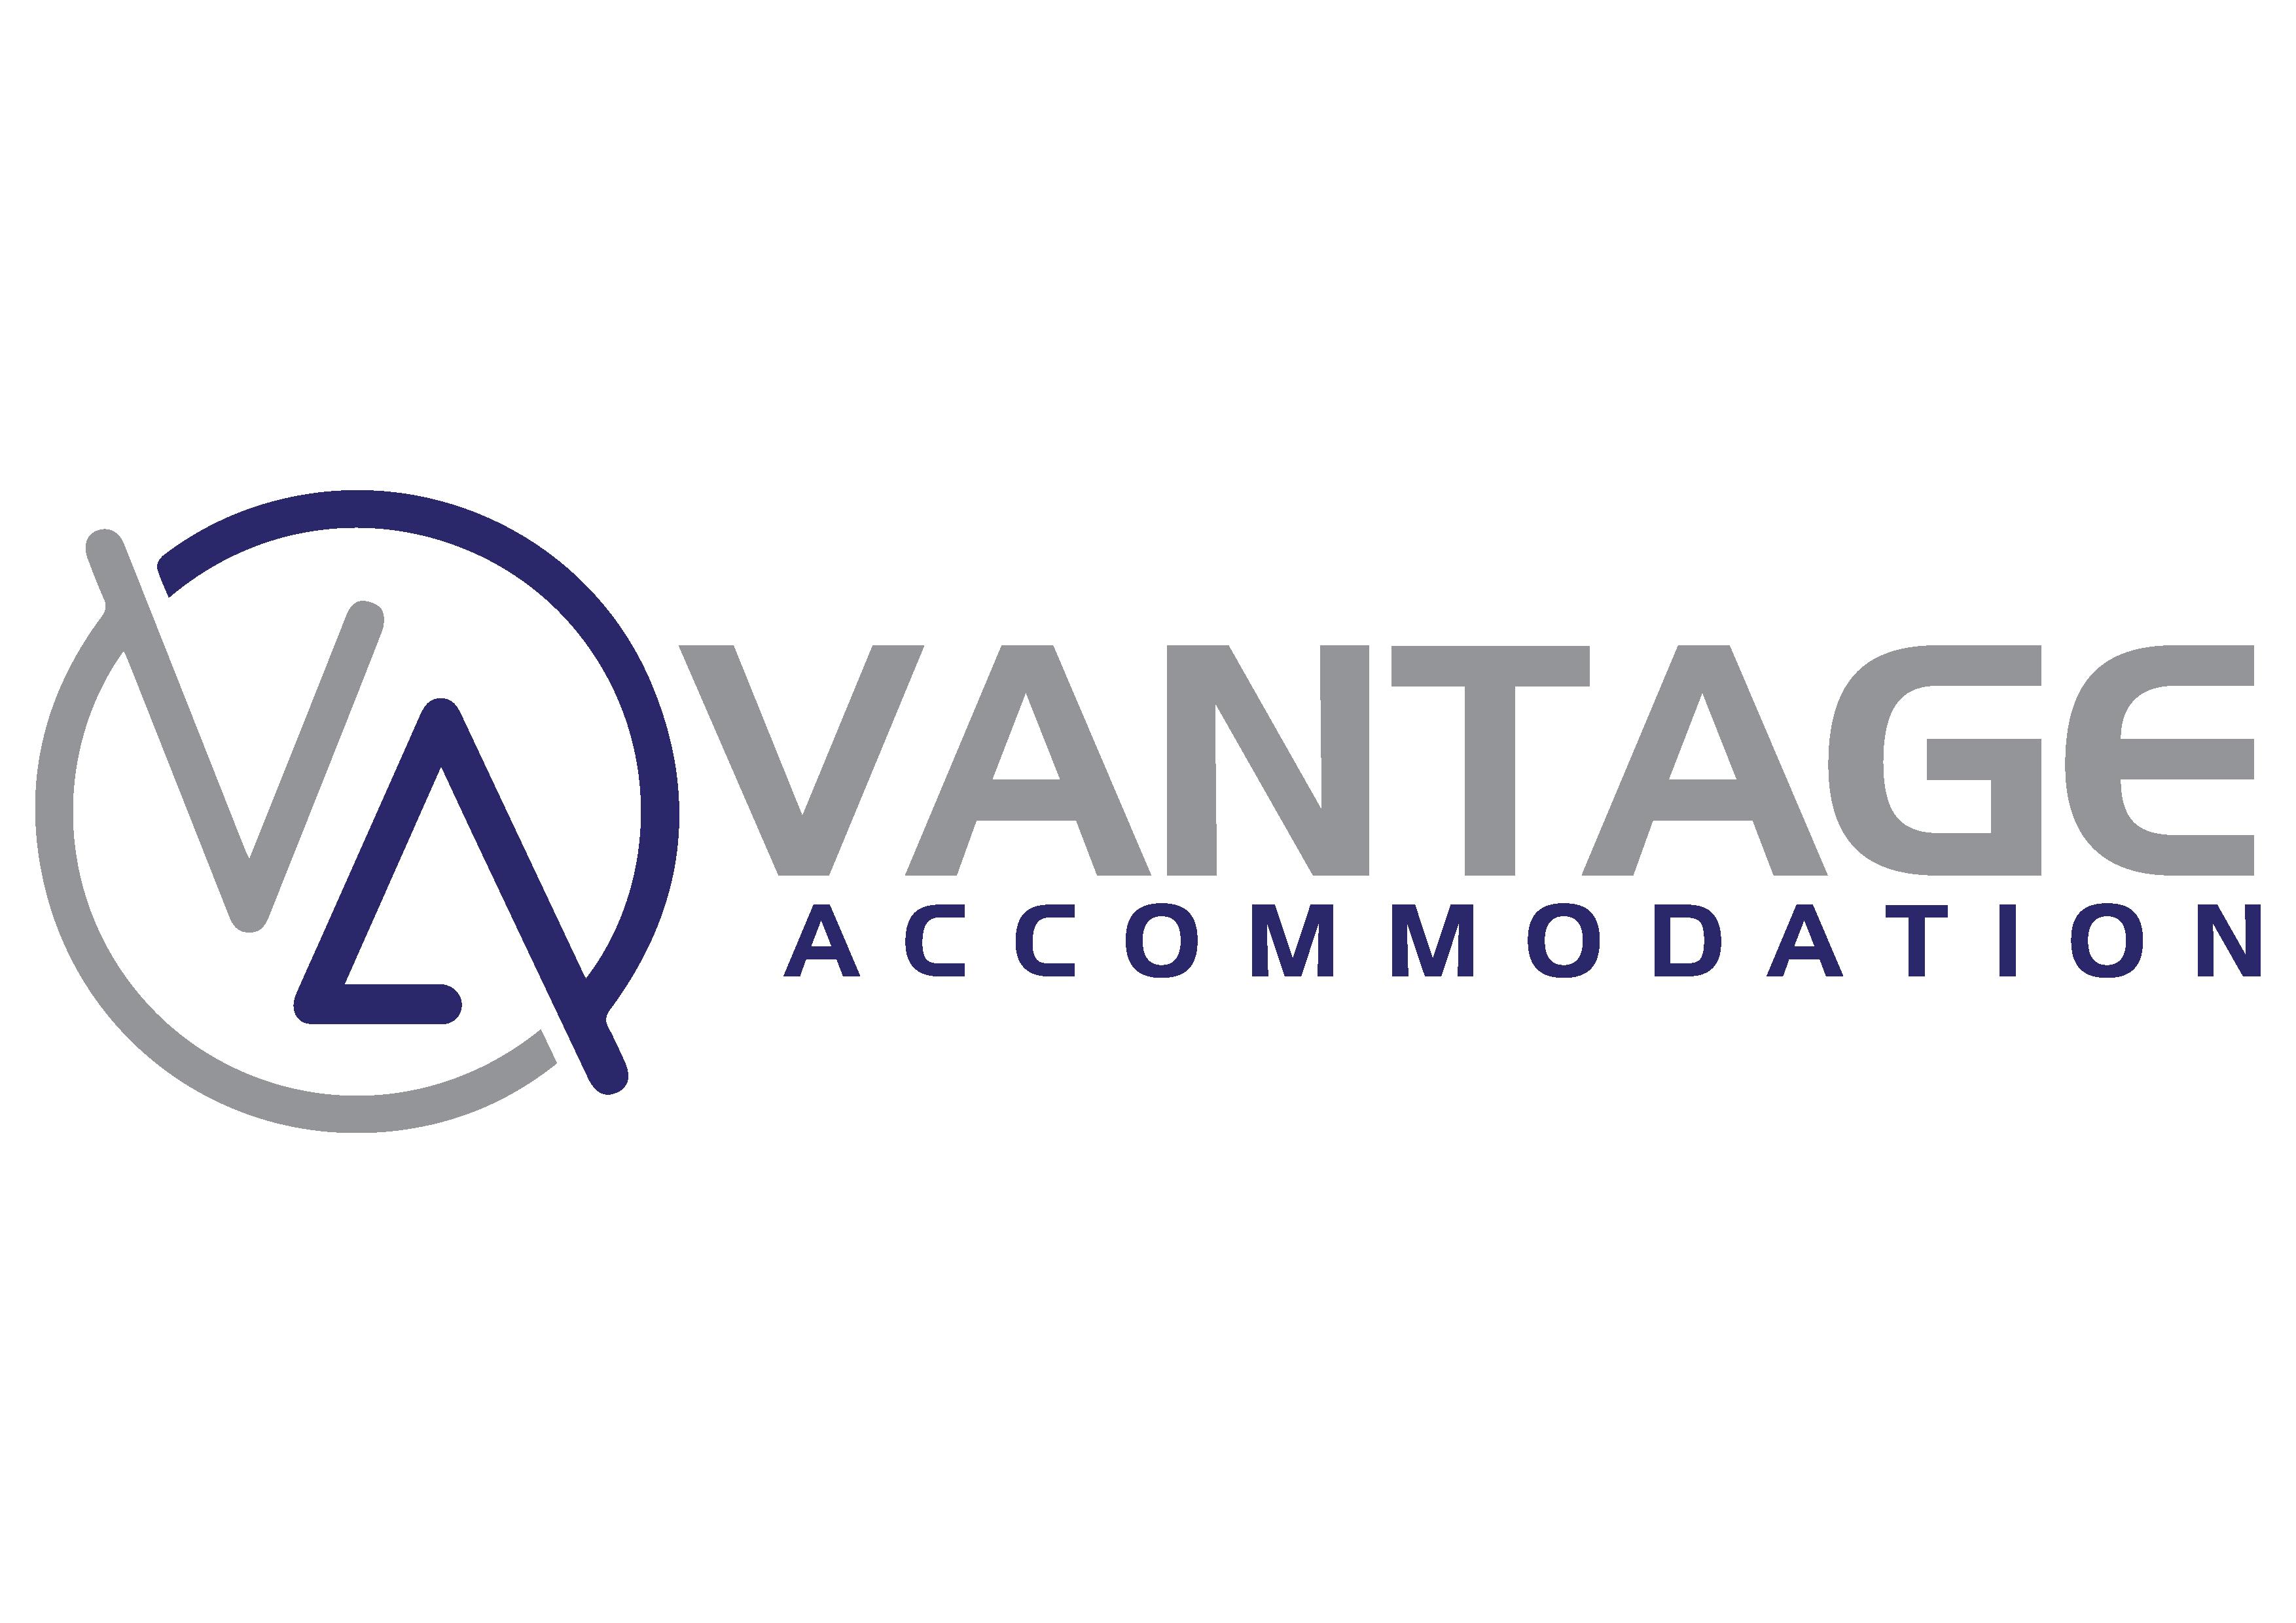 Vantage Accommodation logo